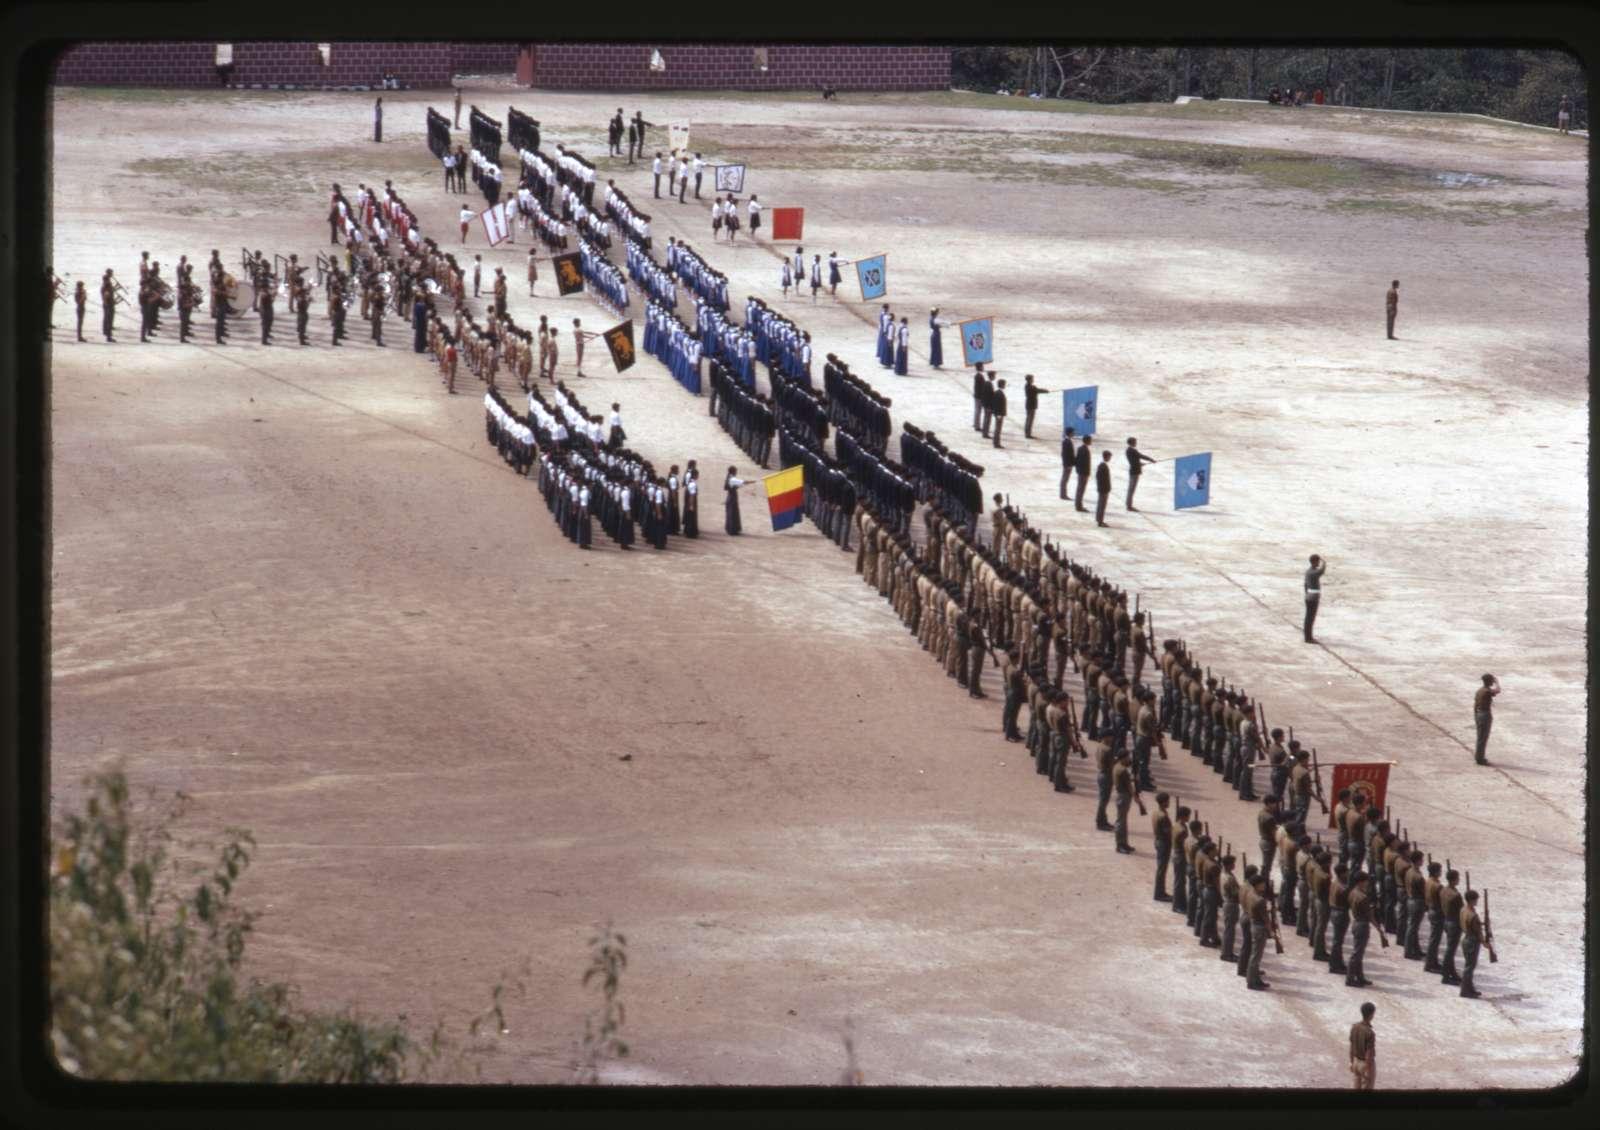 [Birthday parade for King of Sikkim, Gangtok, Sikkim]